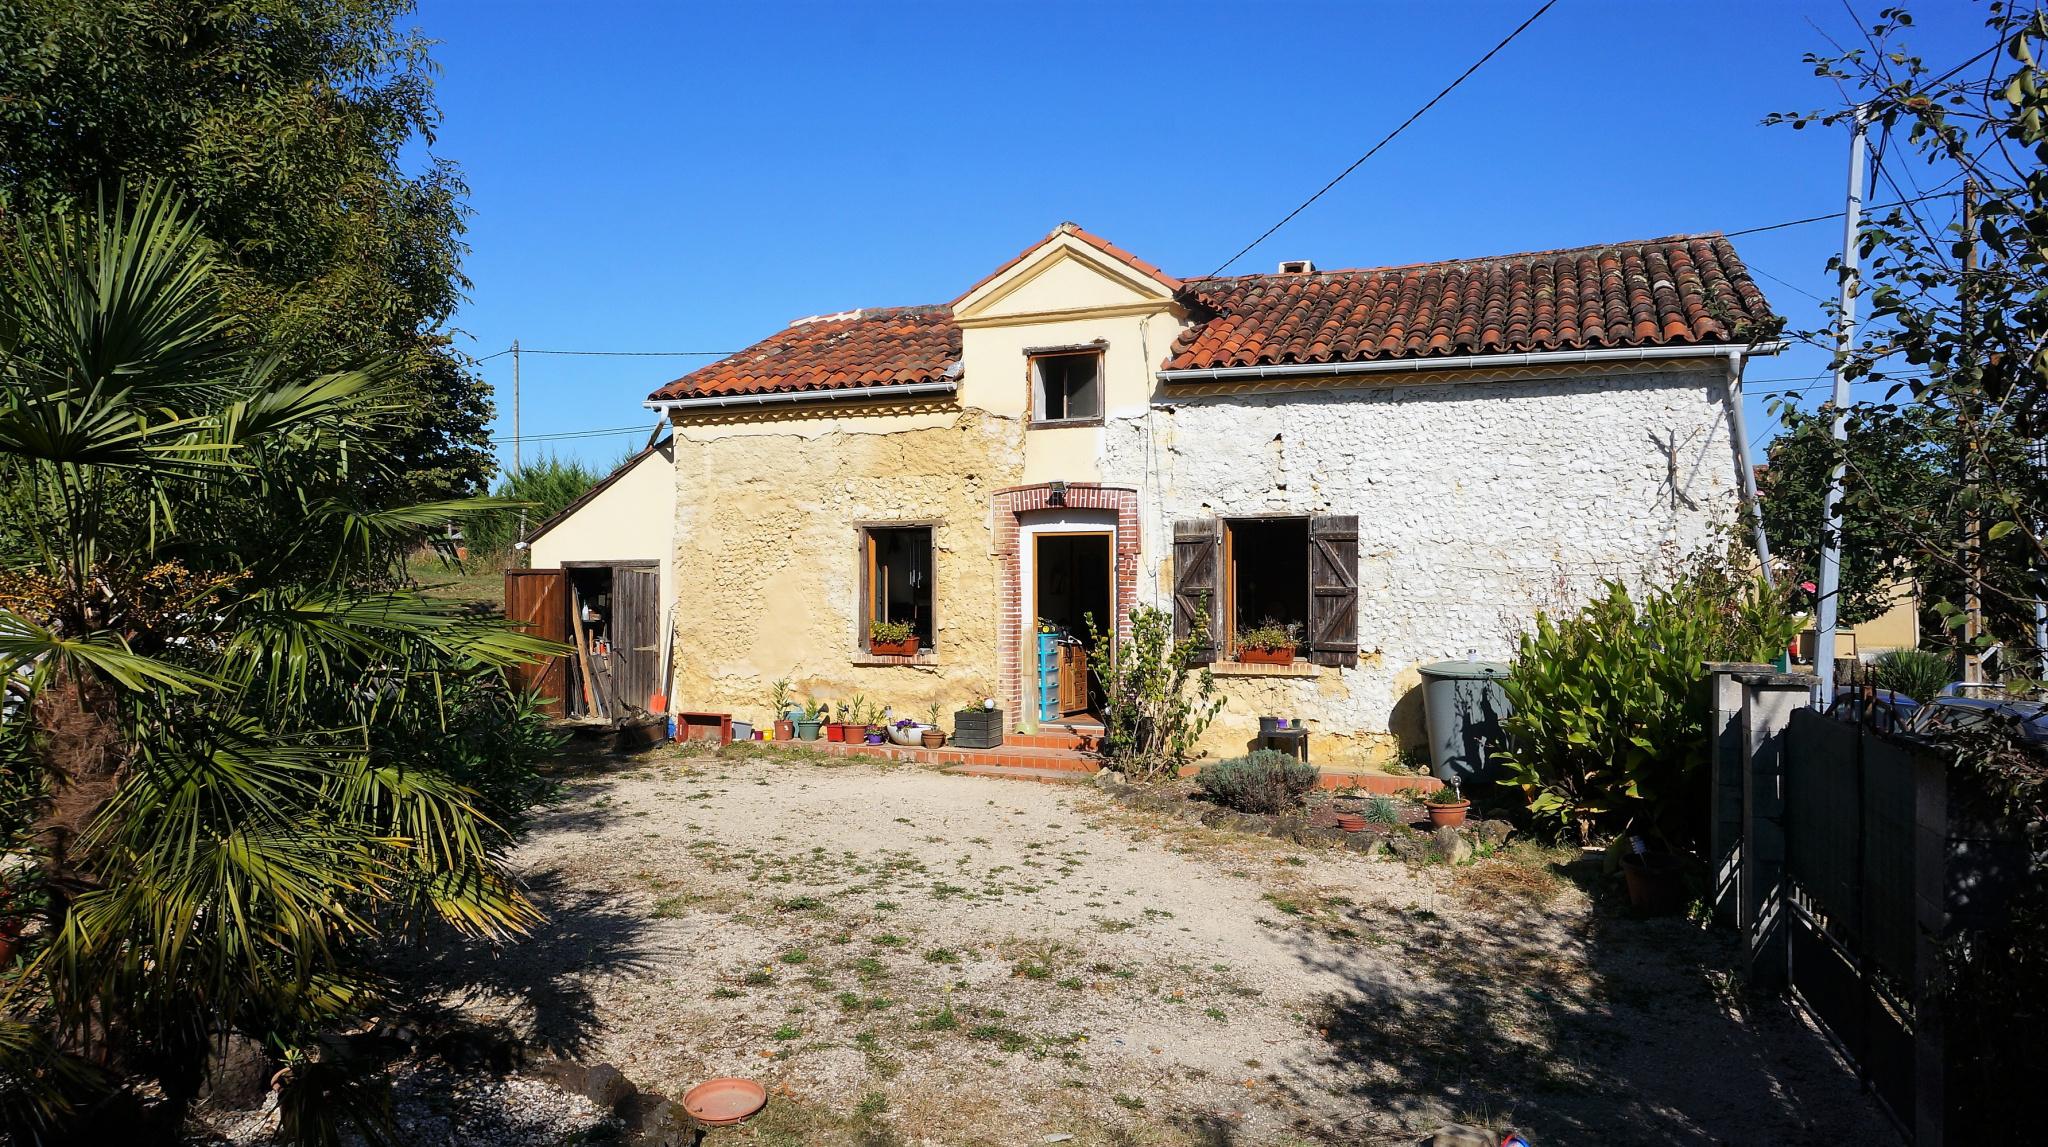 Vente maison/villa 4 pièces viella 32400